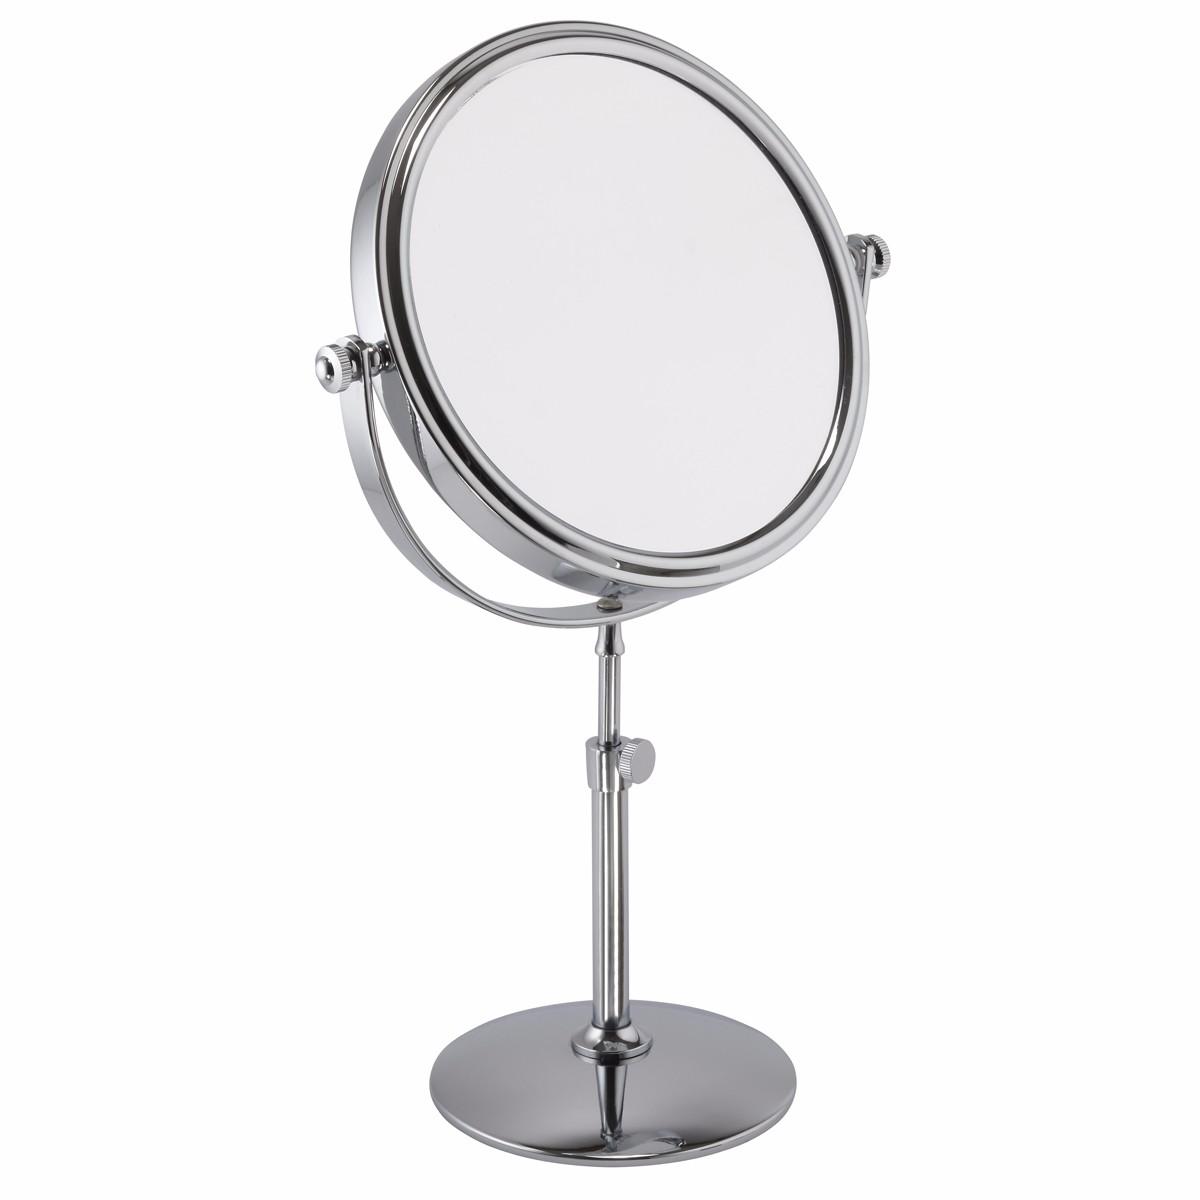 Adjustable 5x Magnification Chrome Mirror - 509/15CHR